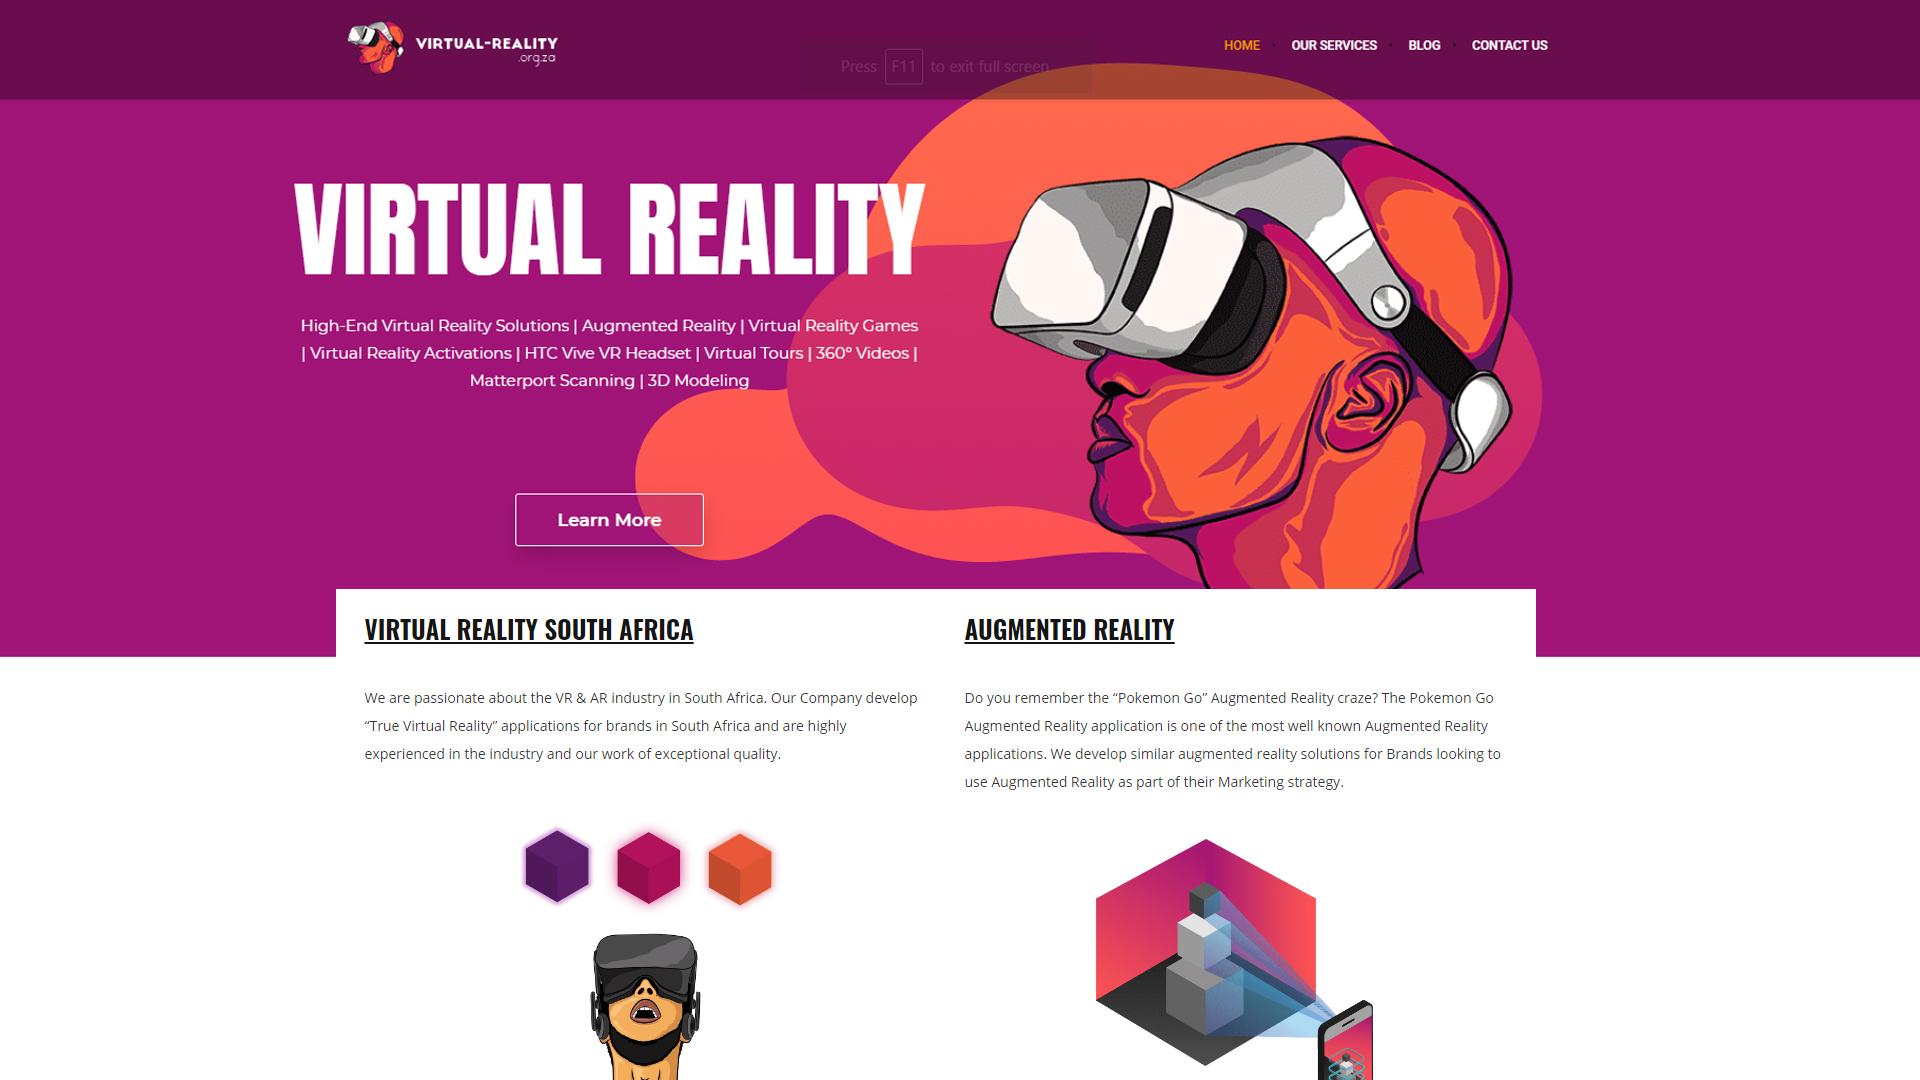 virtual reality organization South Africa